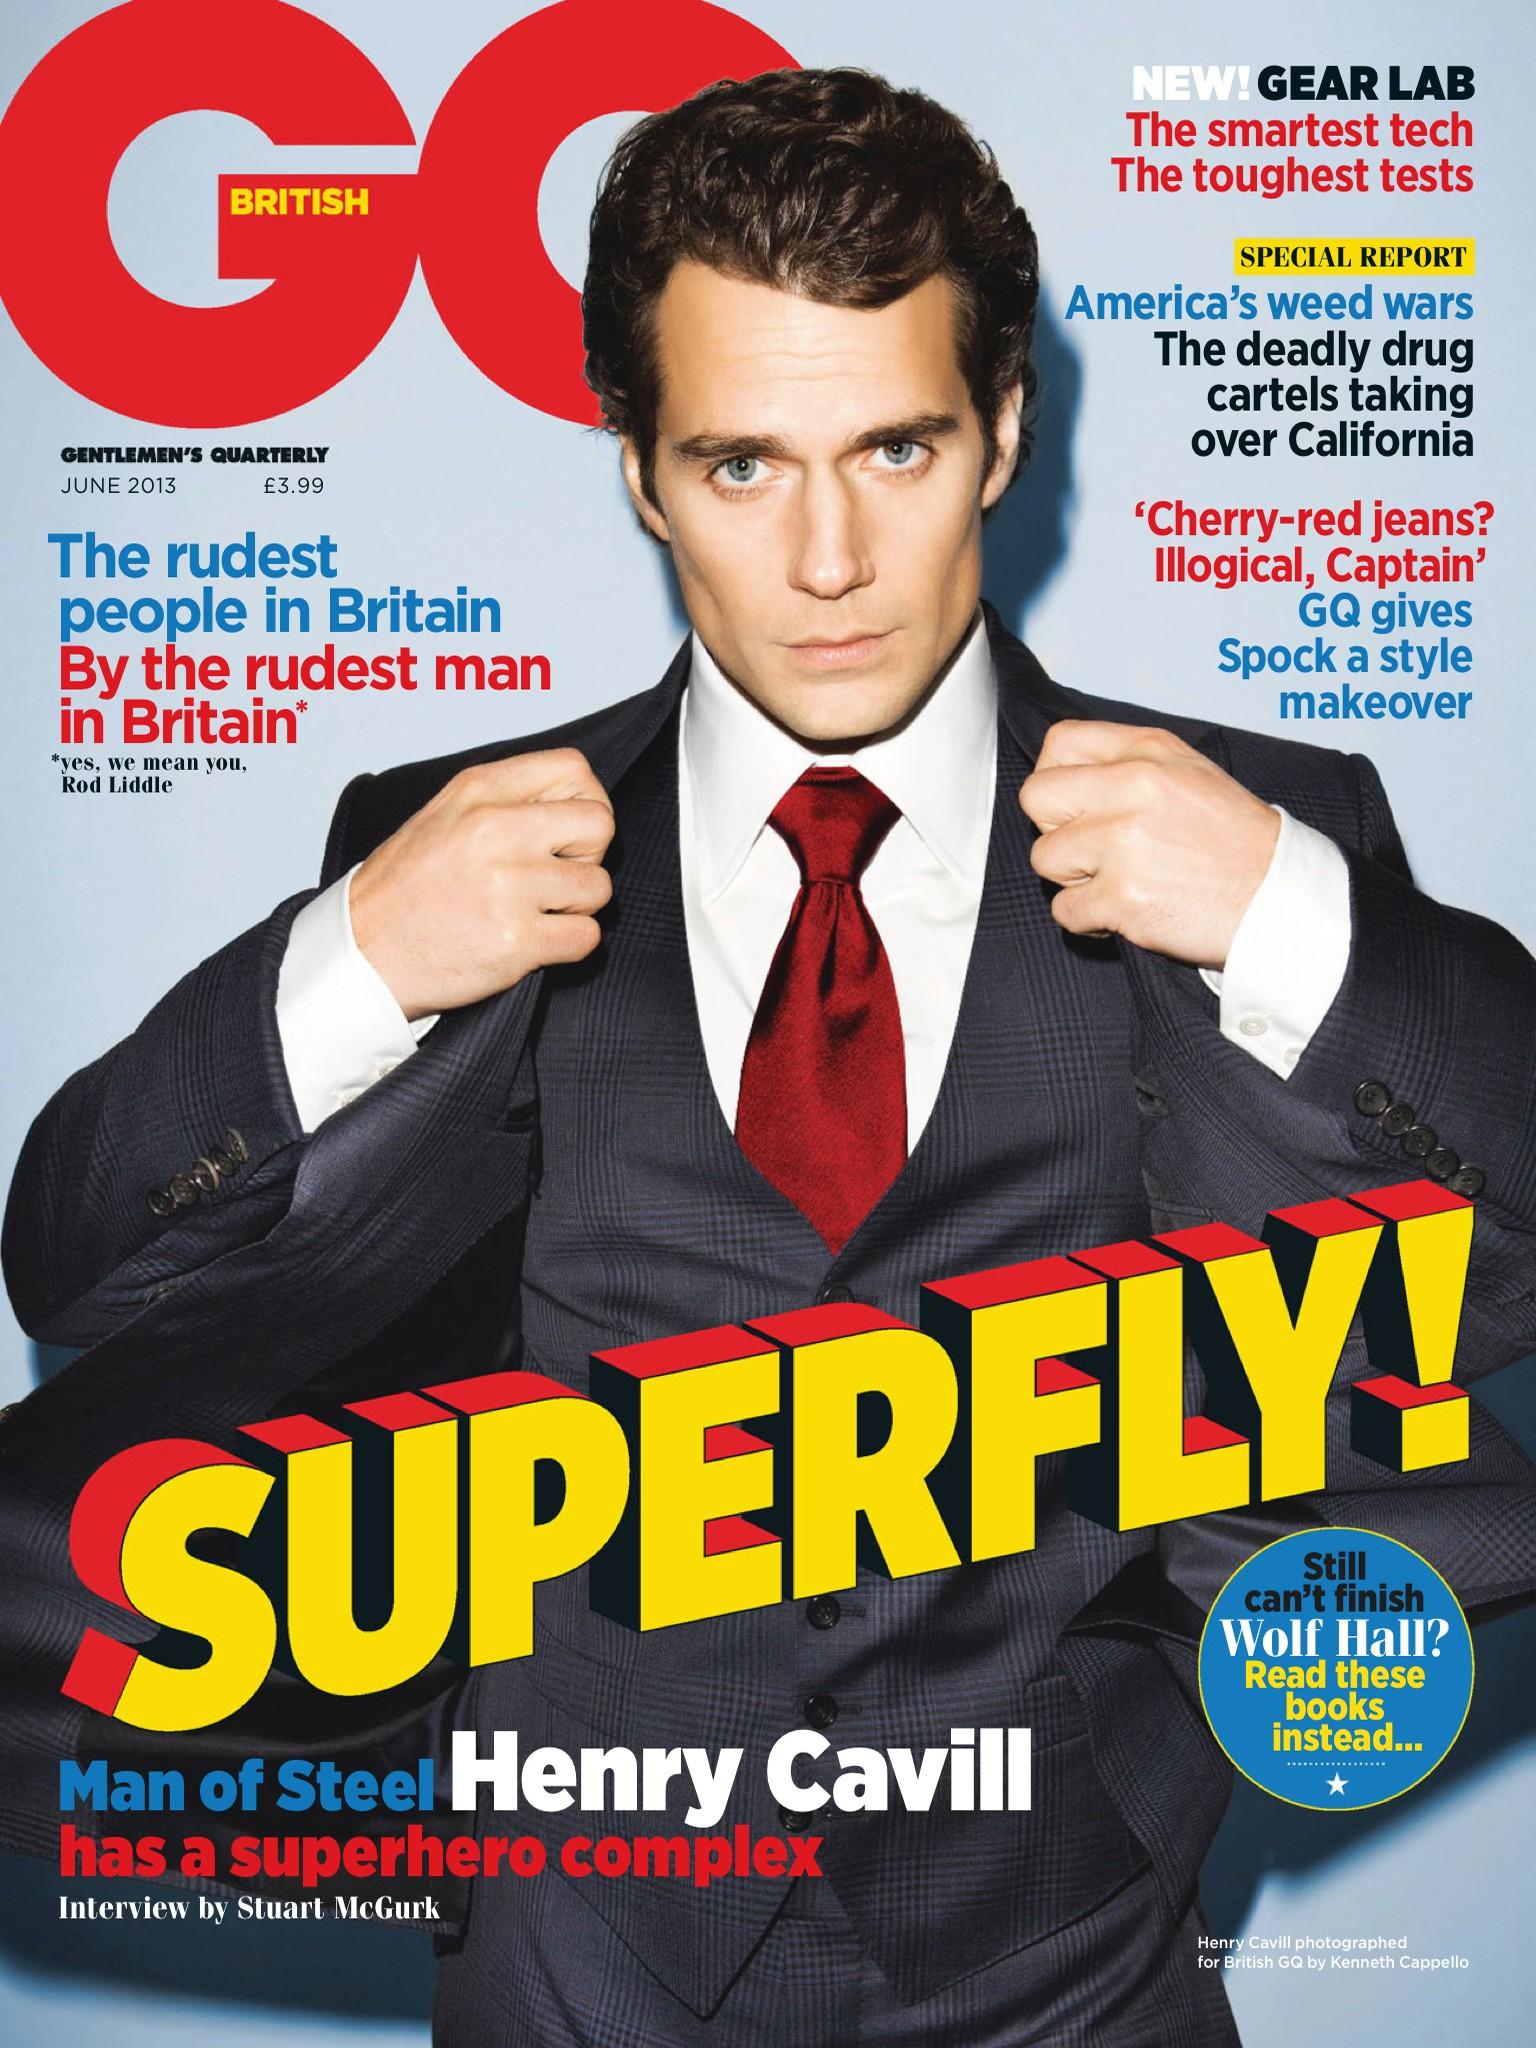 Javier Bardem Covers British GQ, Talks Johnny Depp